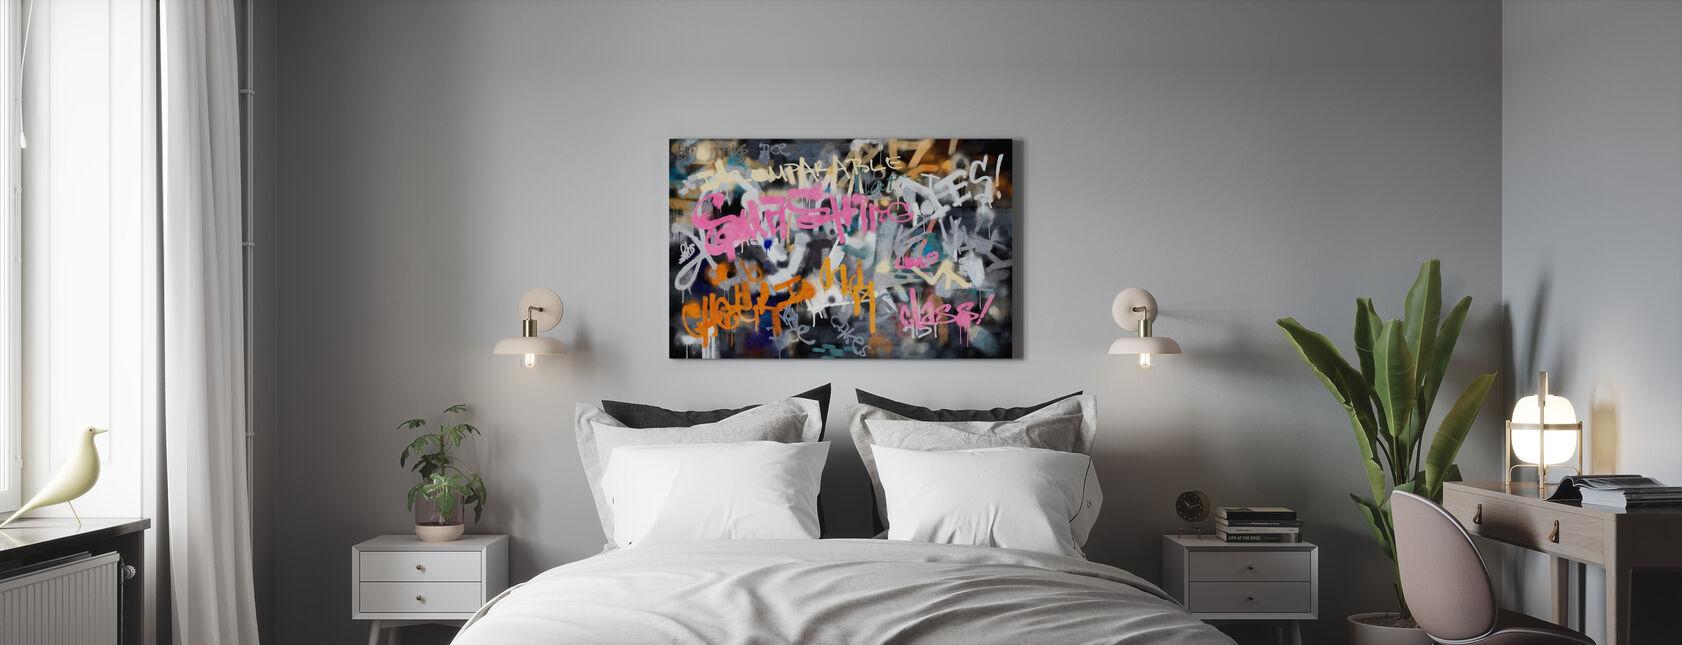 Graffiti-bylinjen - Lerretsbilde - Soverom